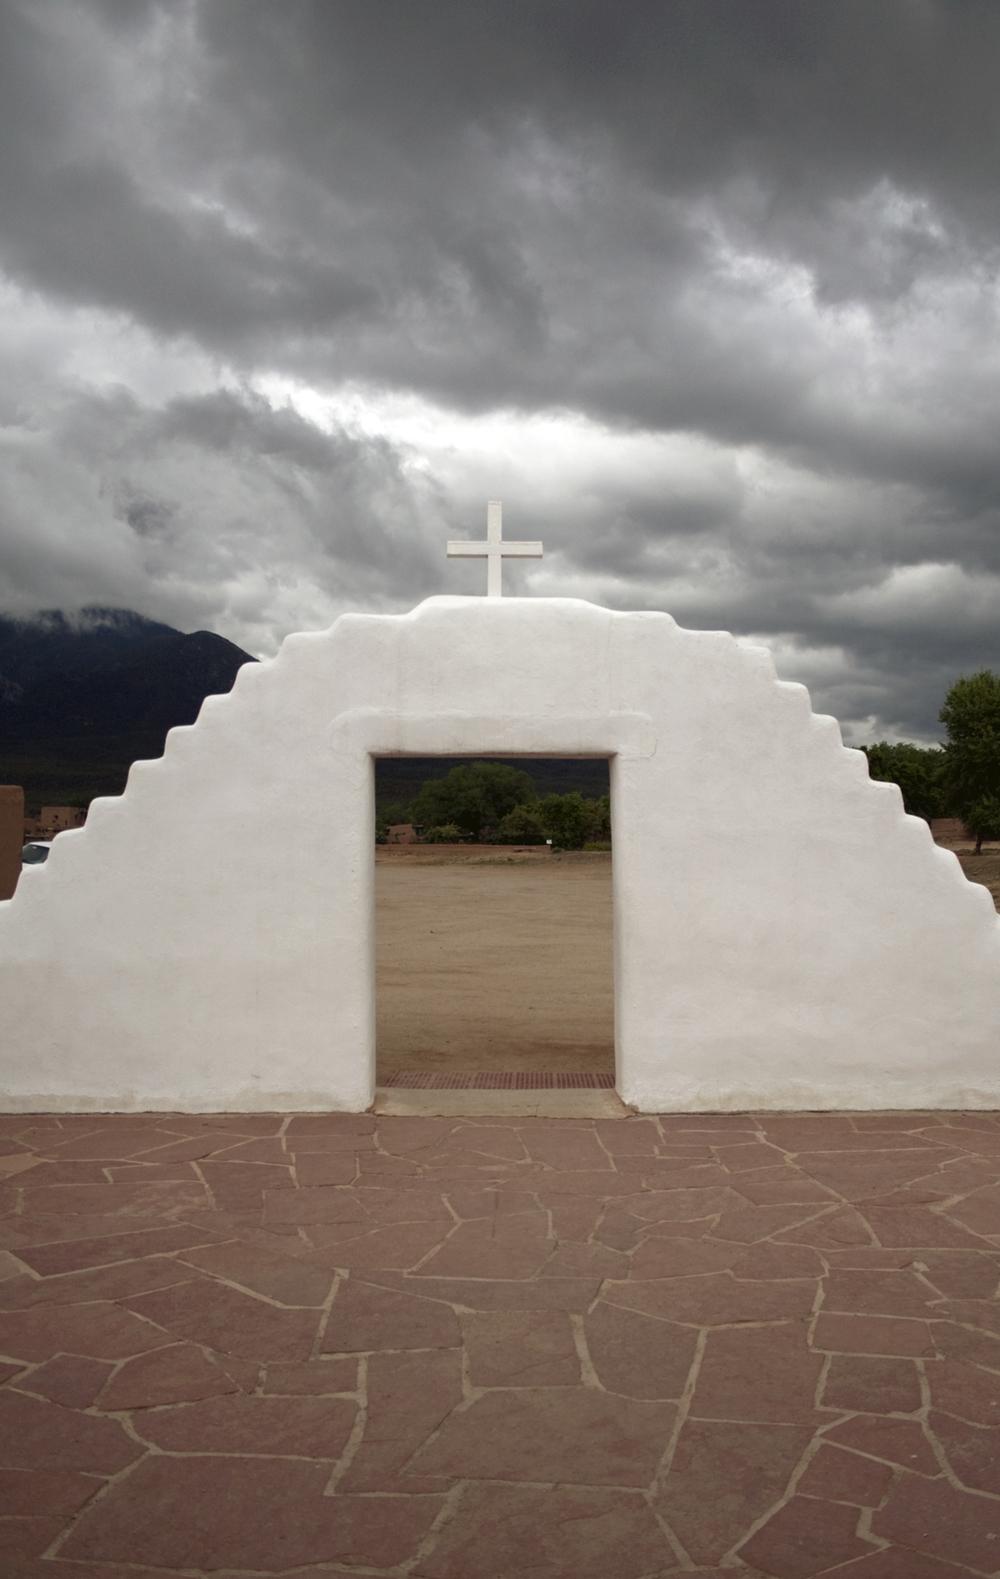 Taos_Pueblo1upload.jpg